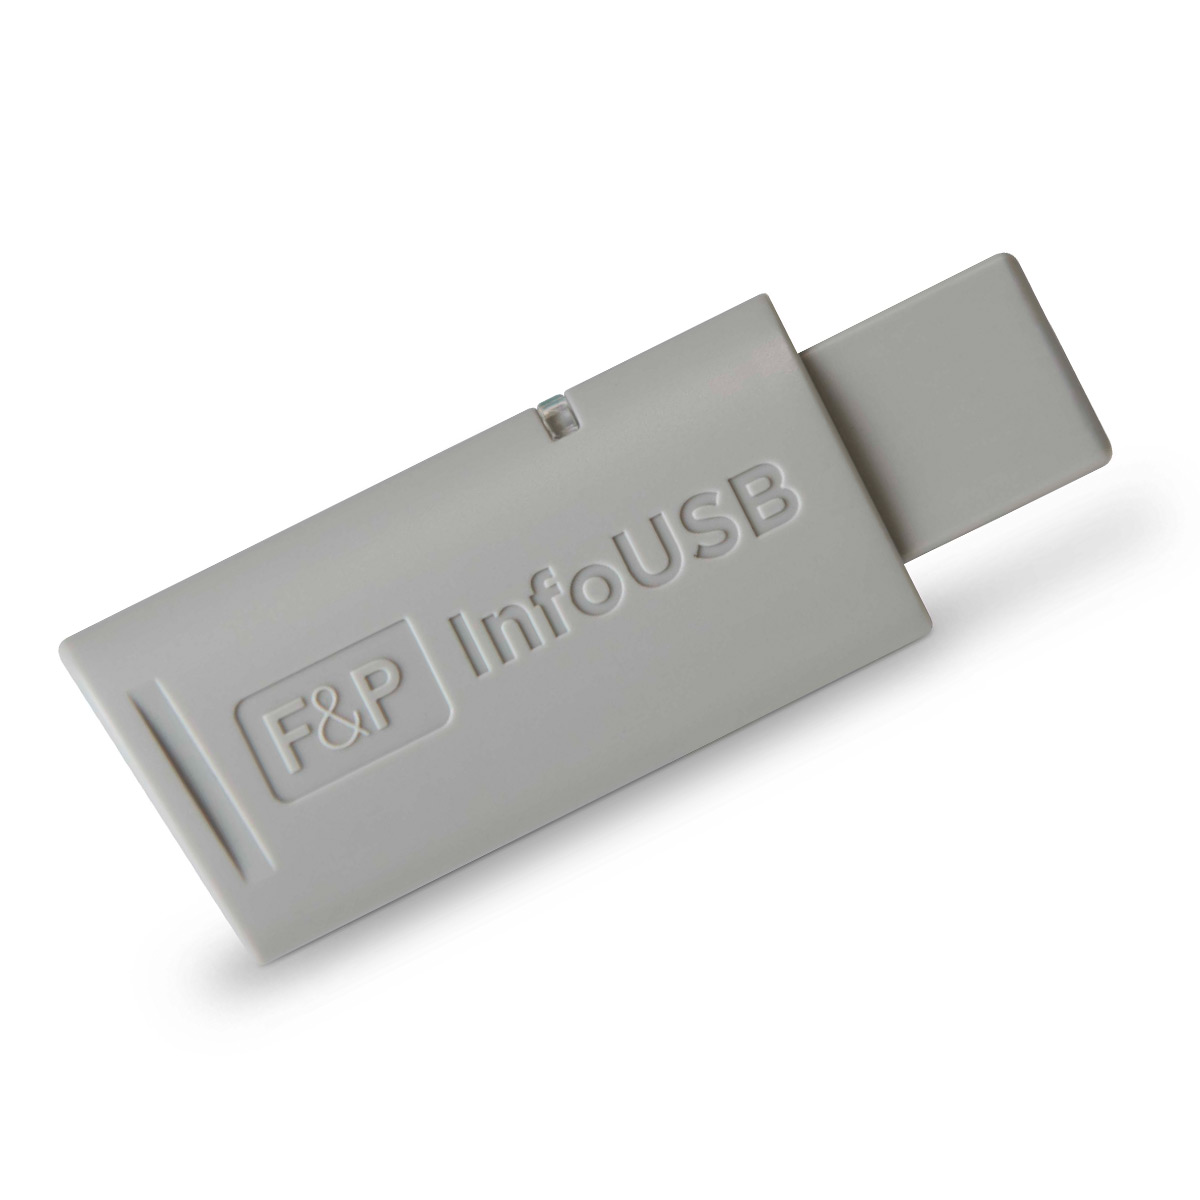 SleepStyle and Icon USB Data Storage Stick